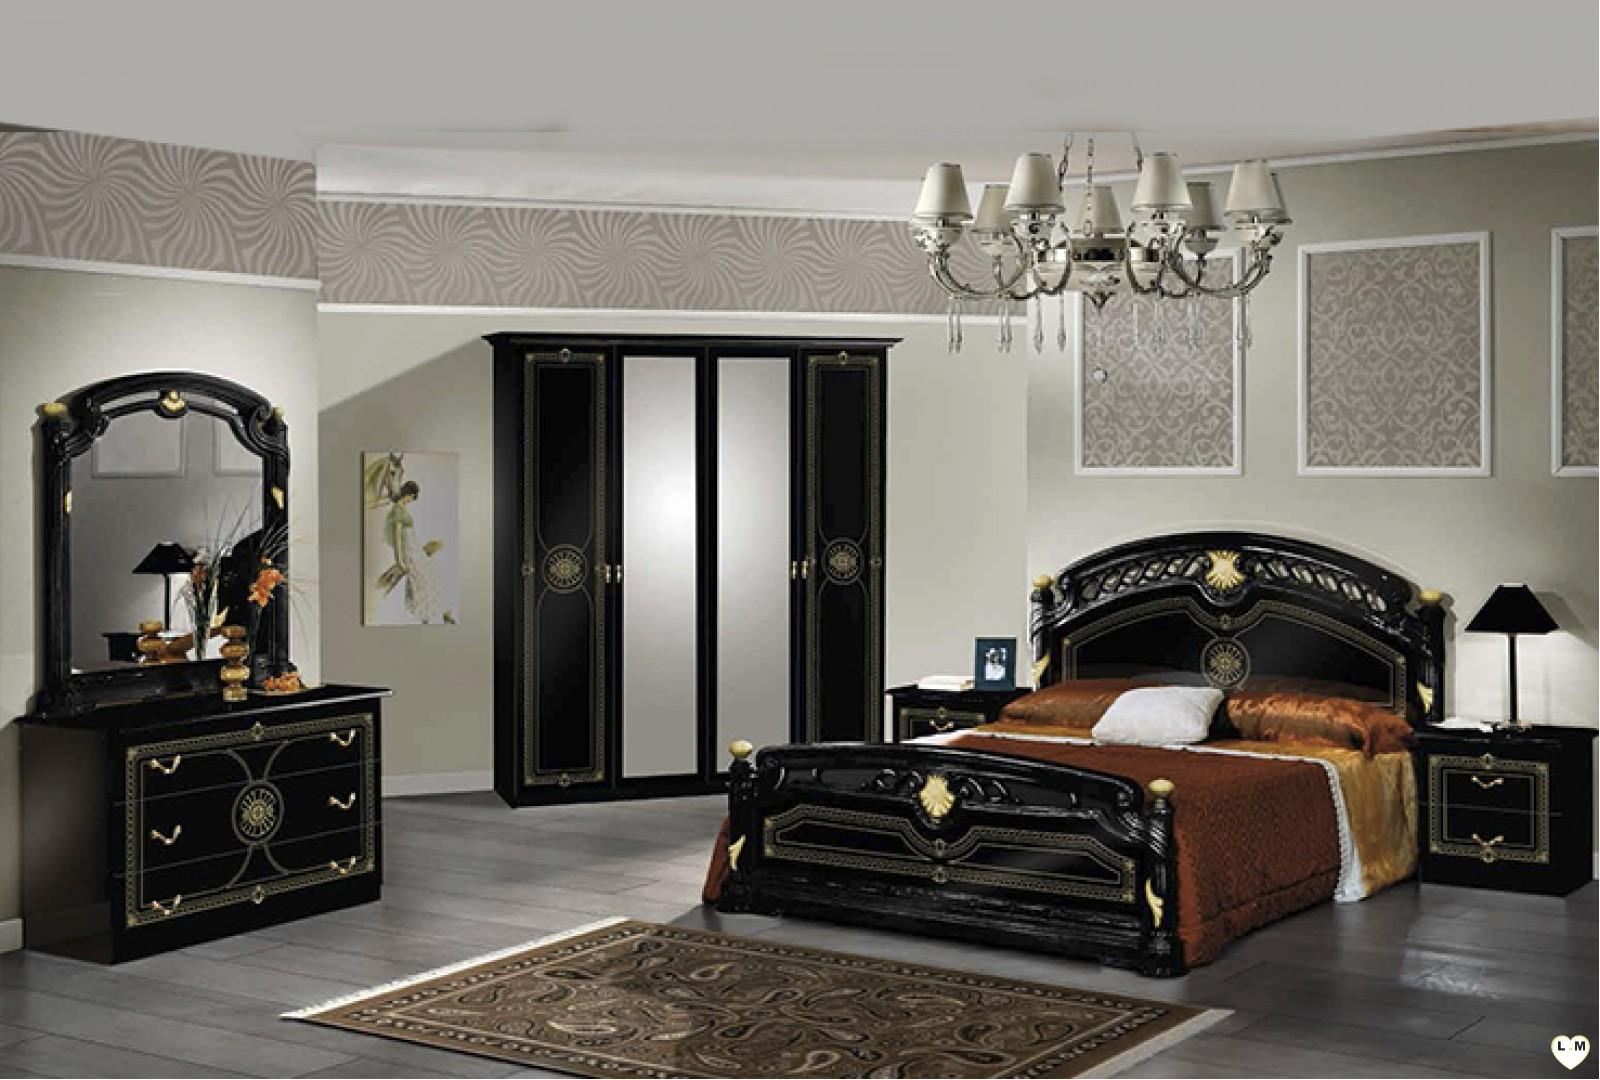 Janeiro laque noir et dore ensemble chambre a coucher for Ensemble de chambre a coucher pas cher